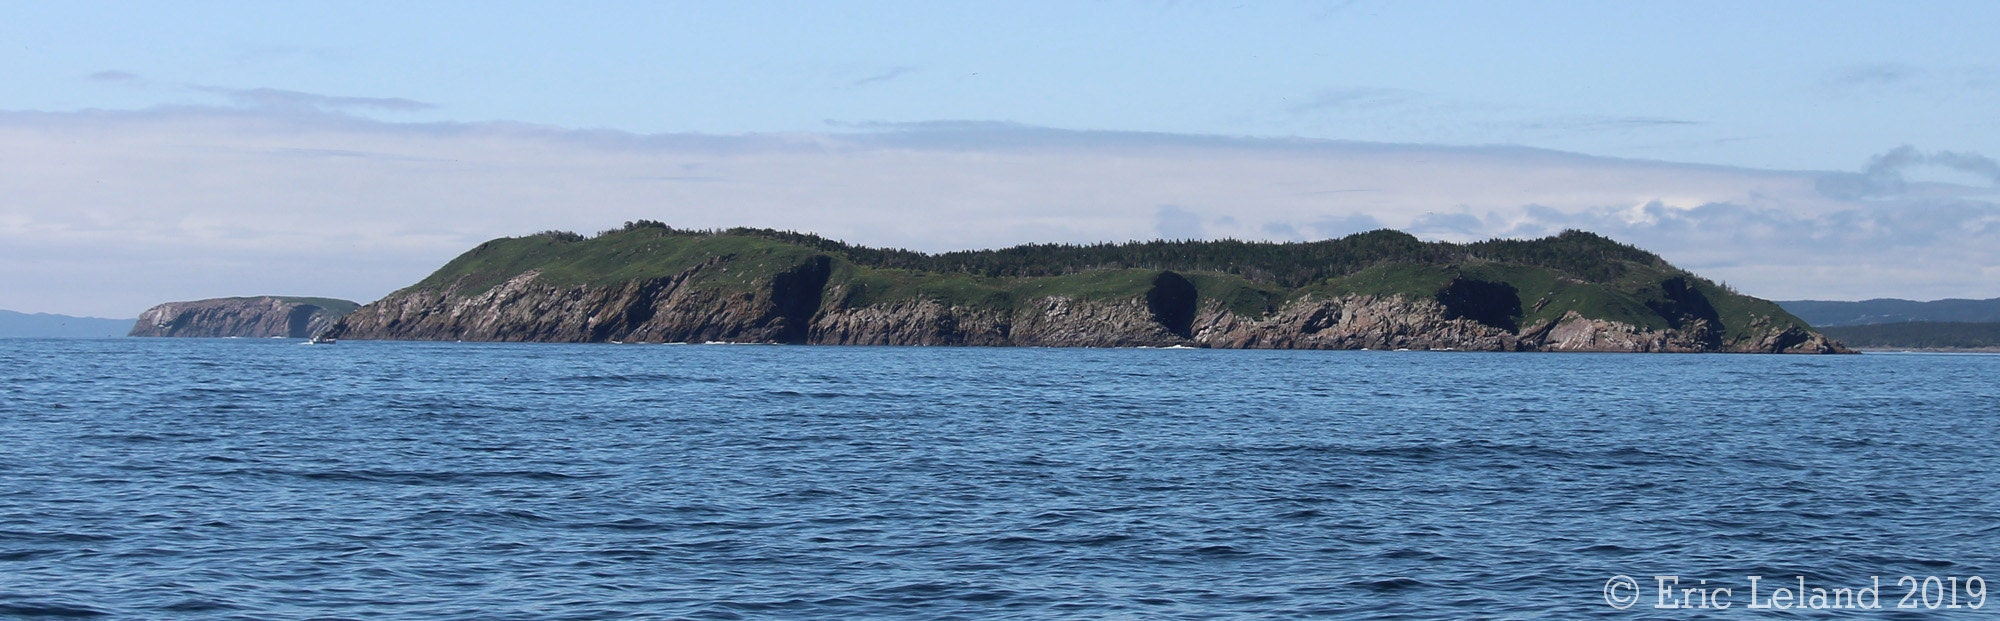 Gull Island, NL